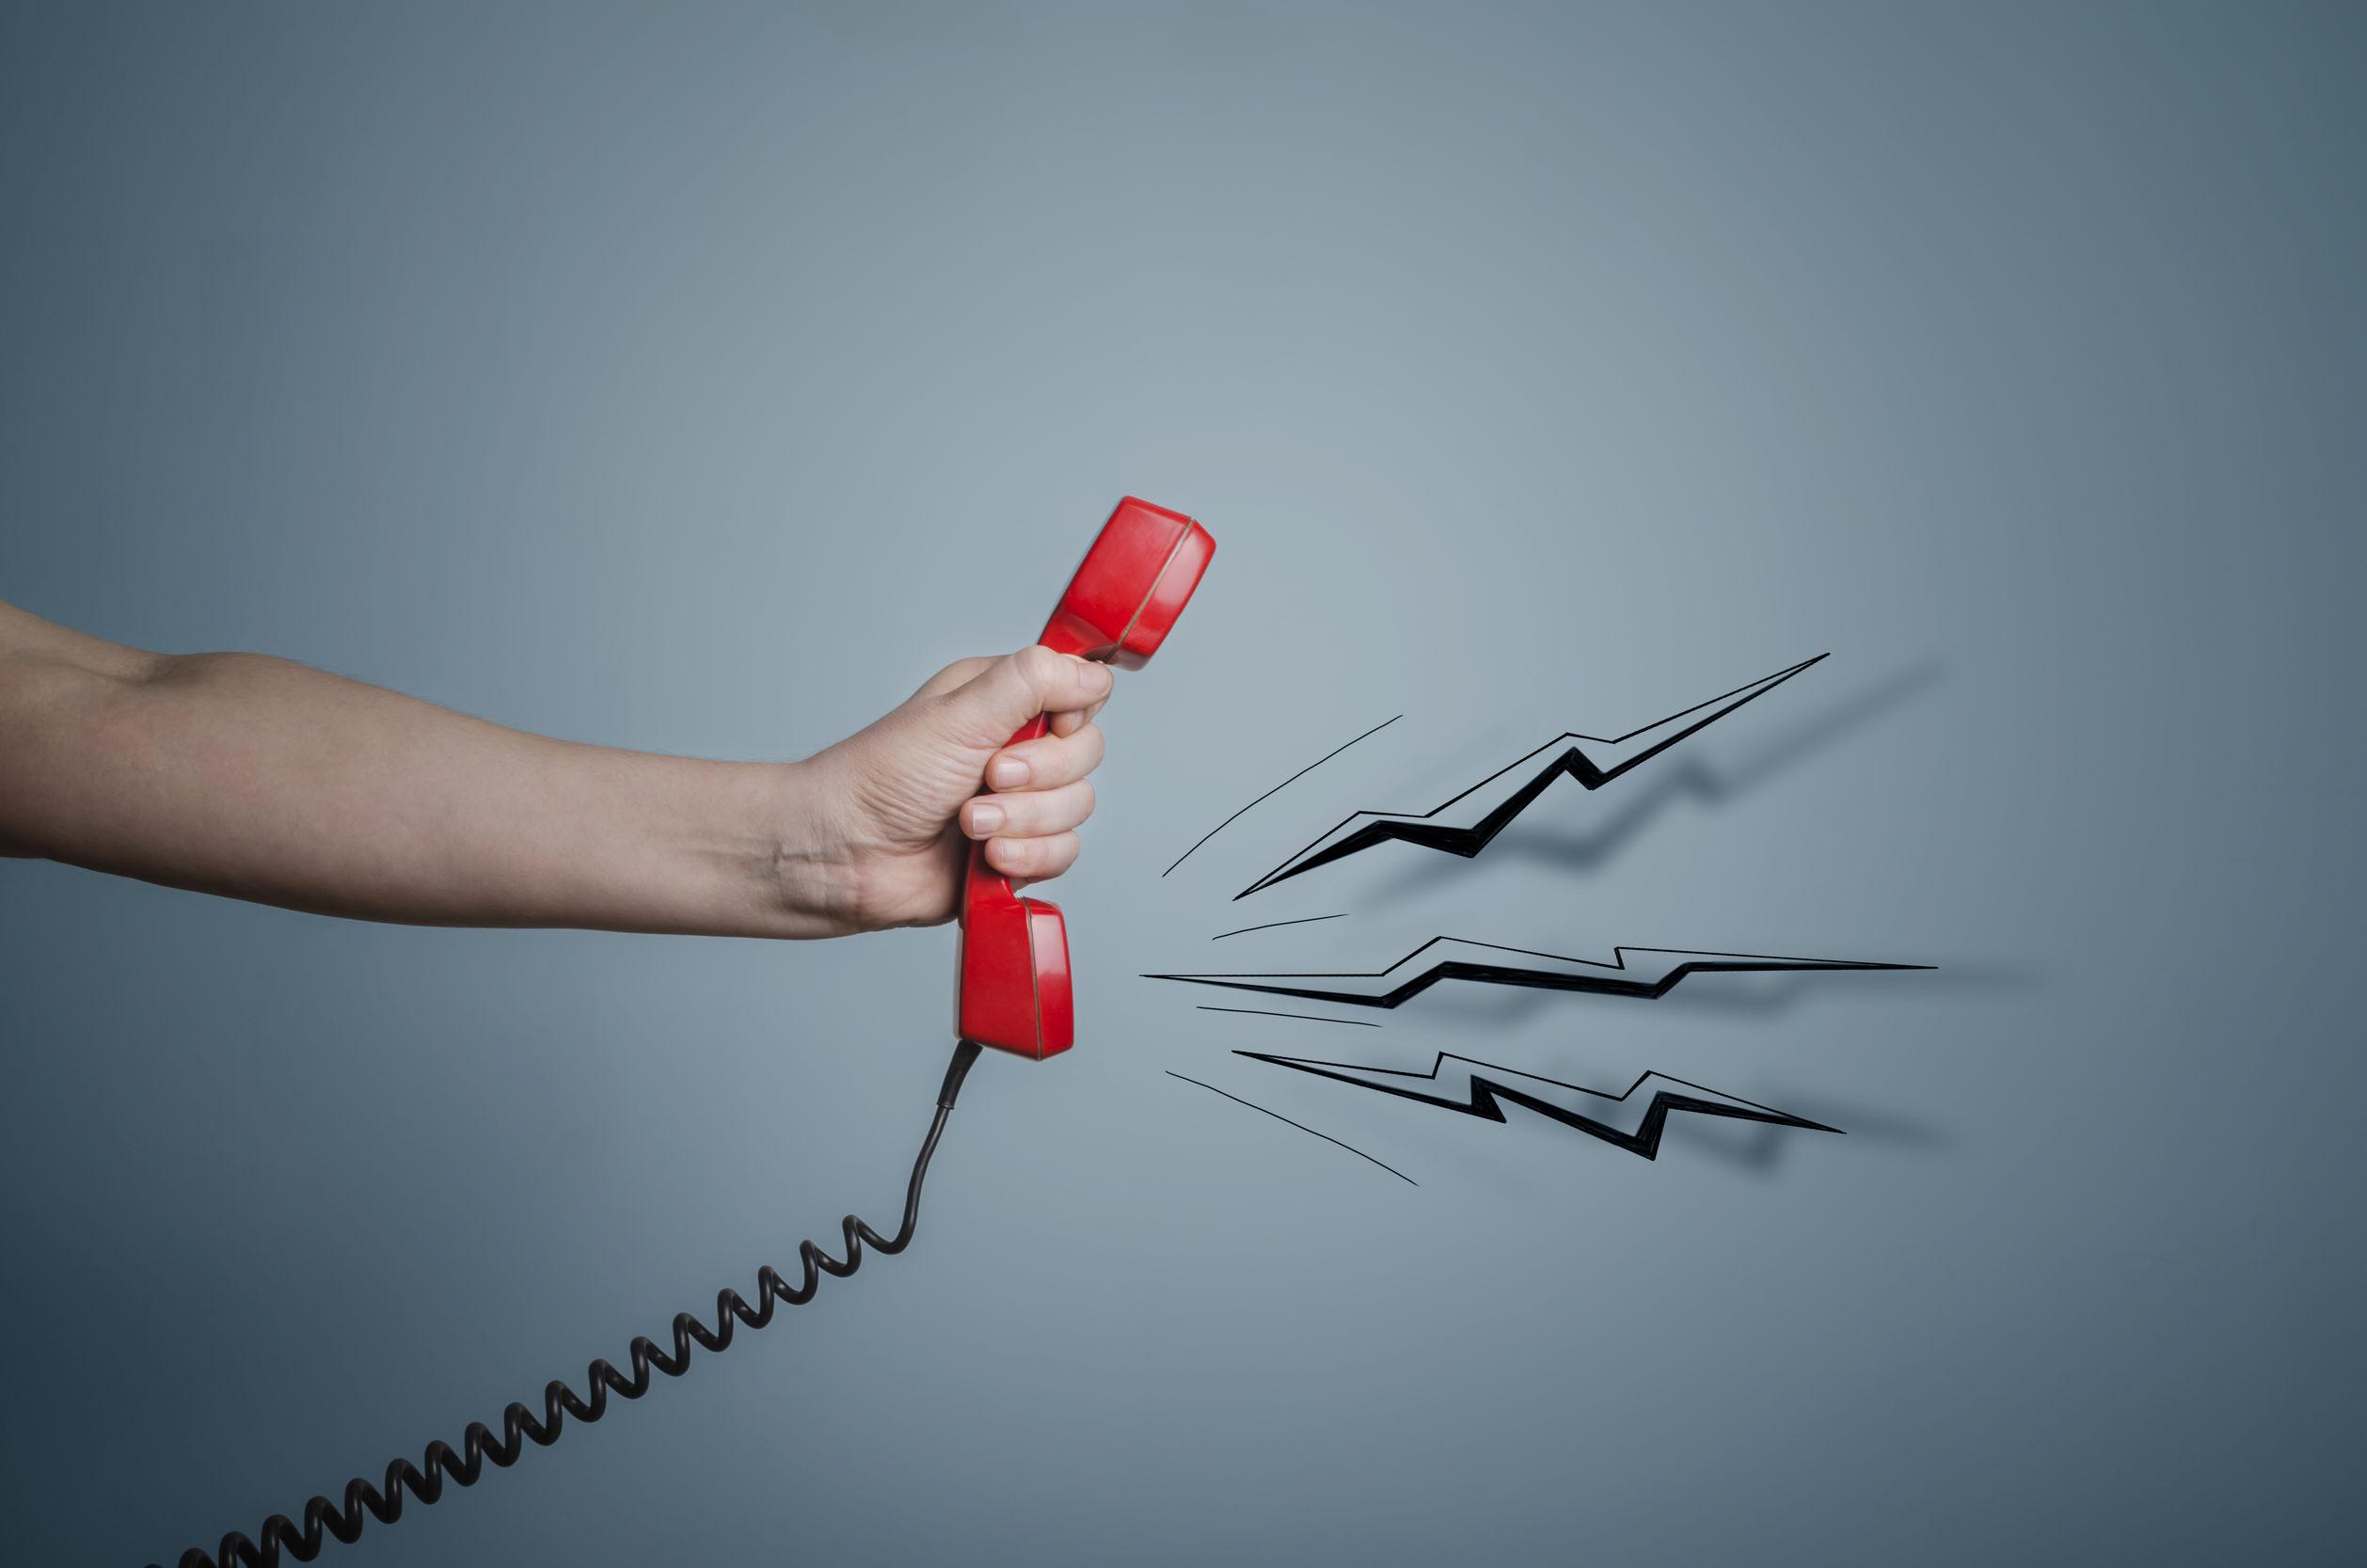 10 Minutes Abusive Customers